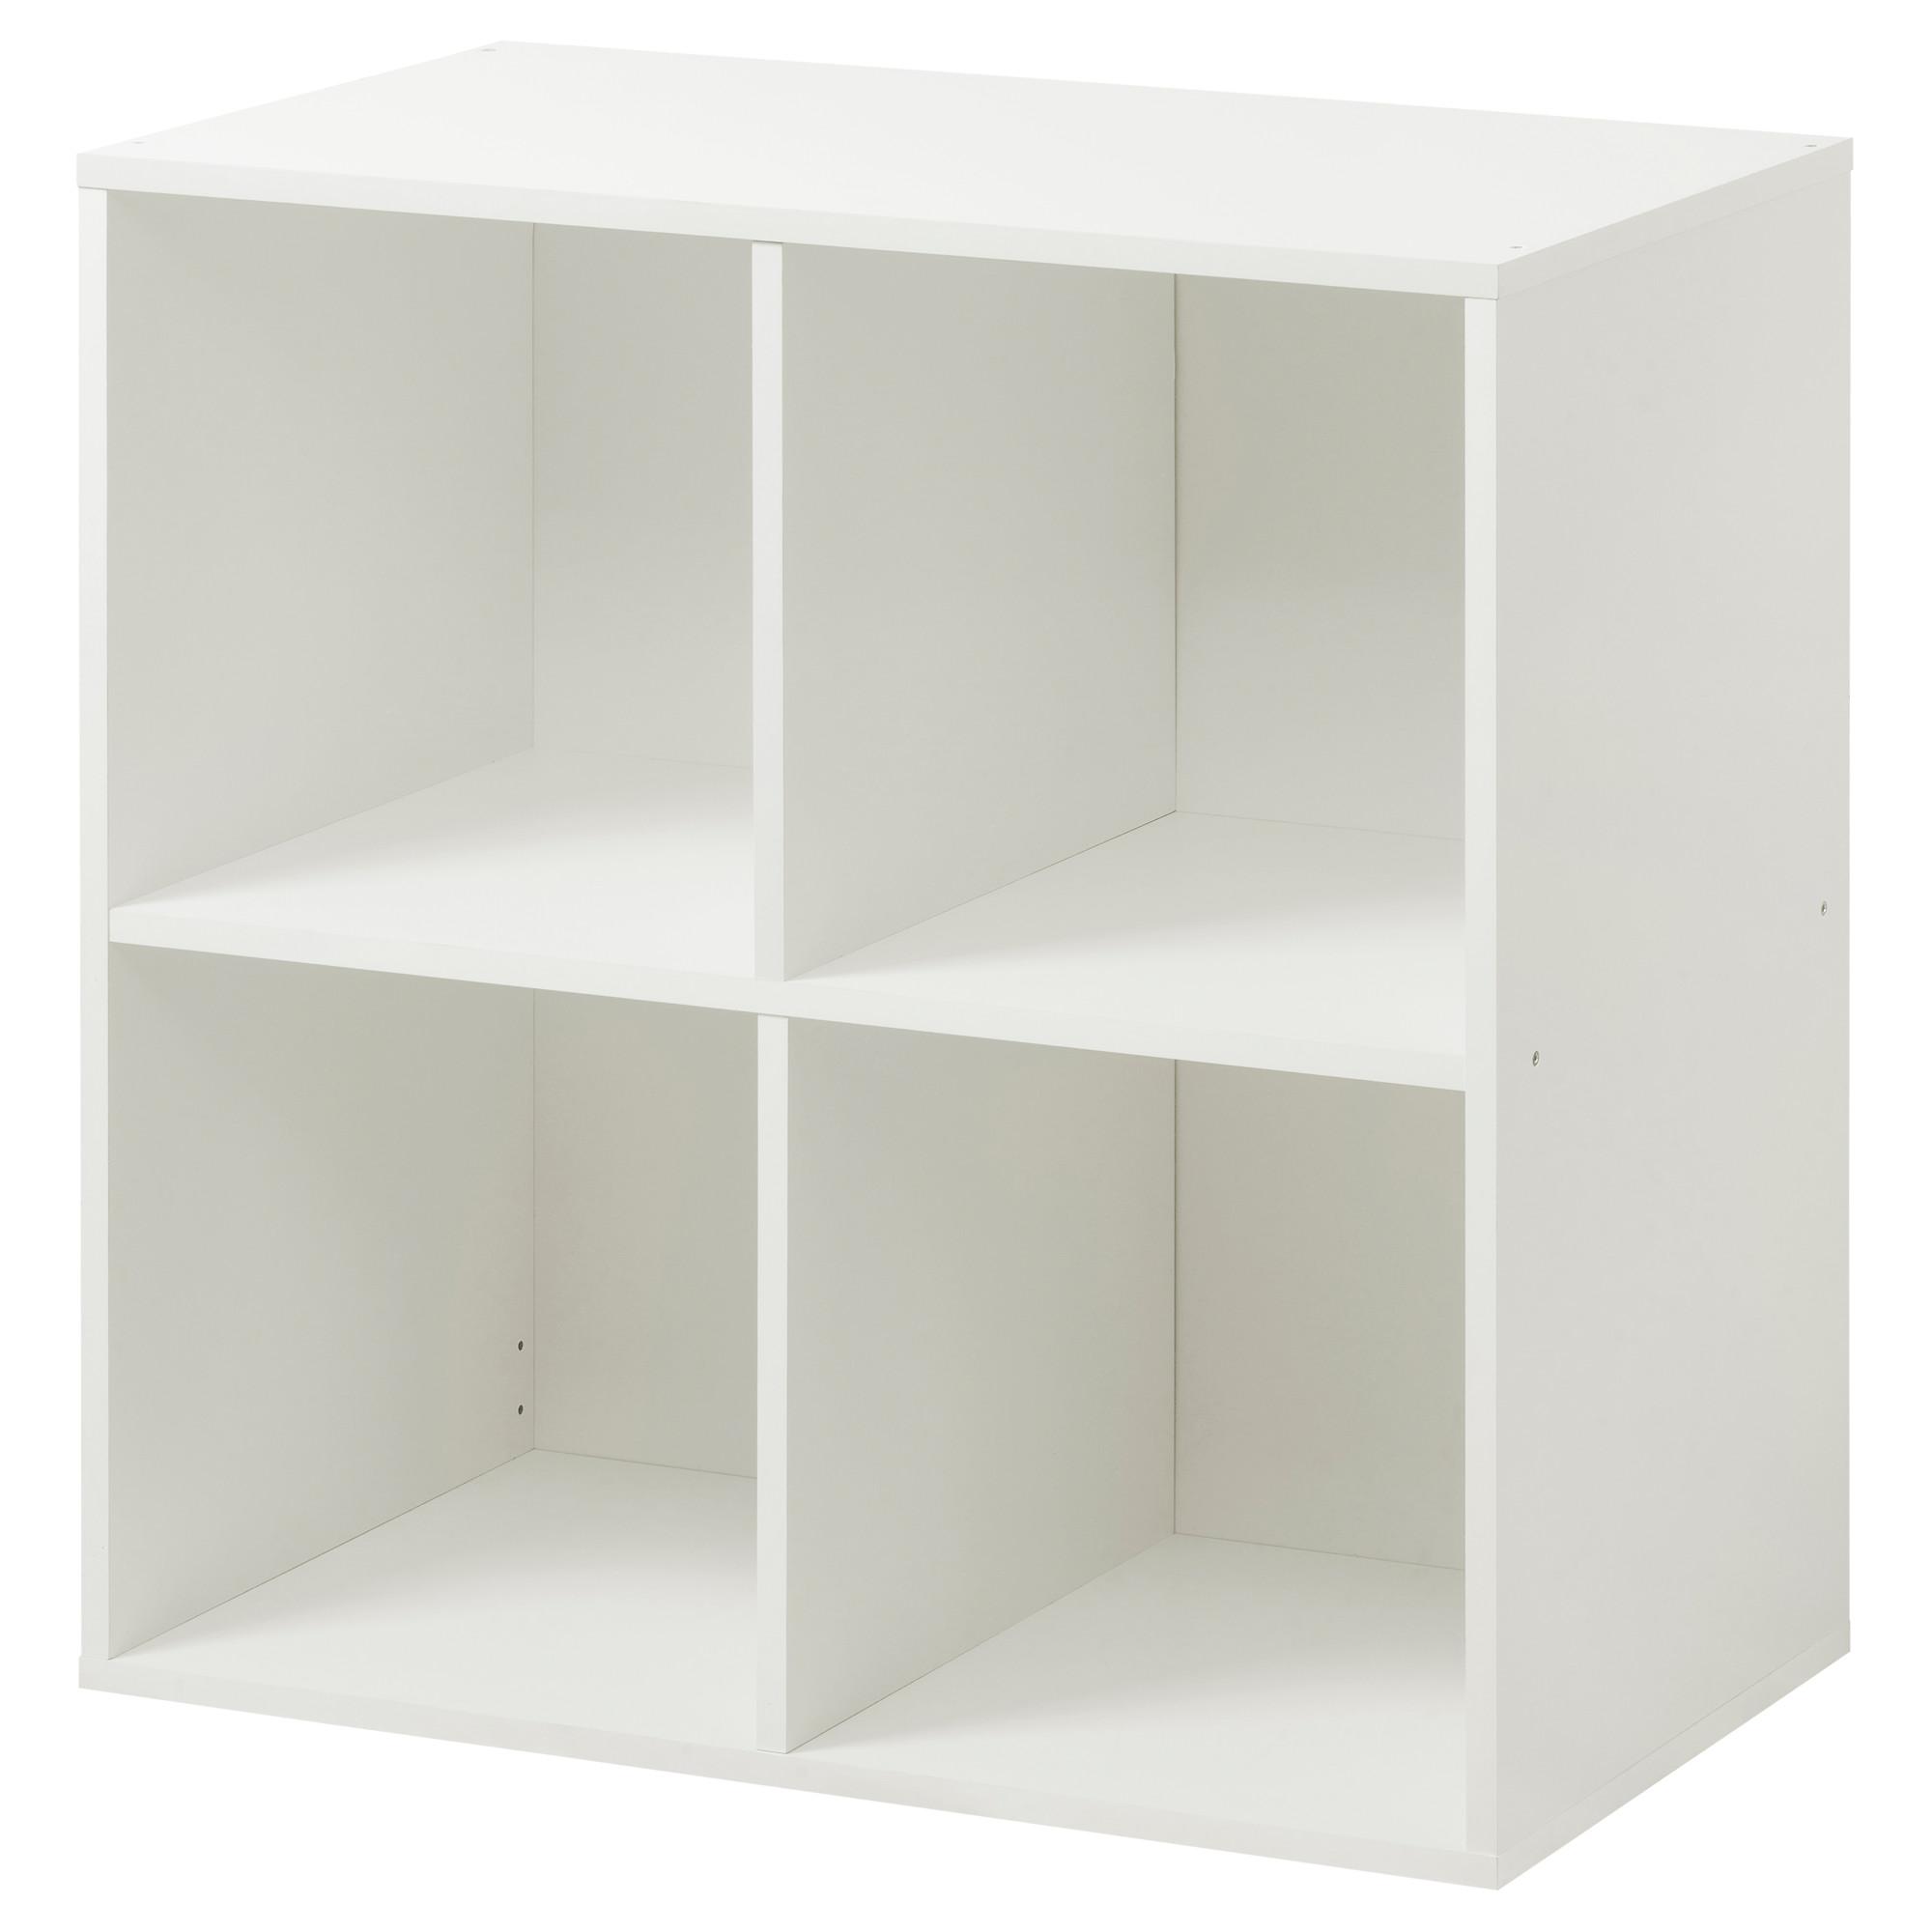 Us Furniture And Home Furnishings Ikea Shelves Bedroom Shelving Unit Small Storage Shelves